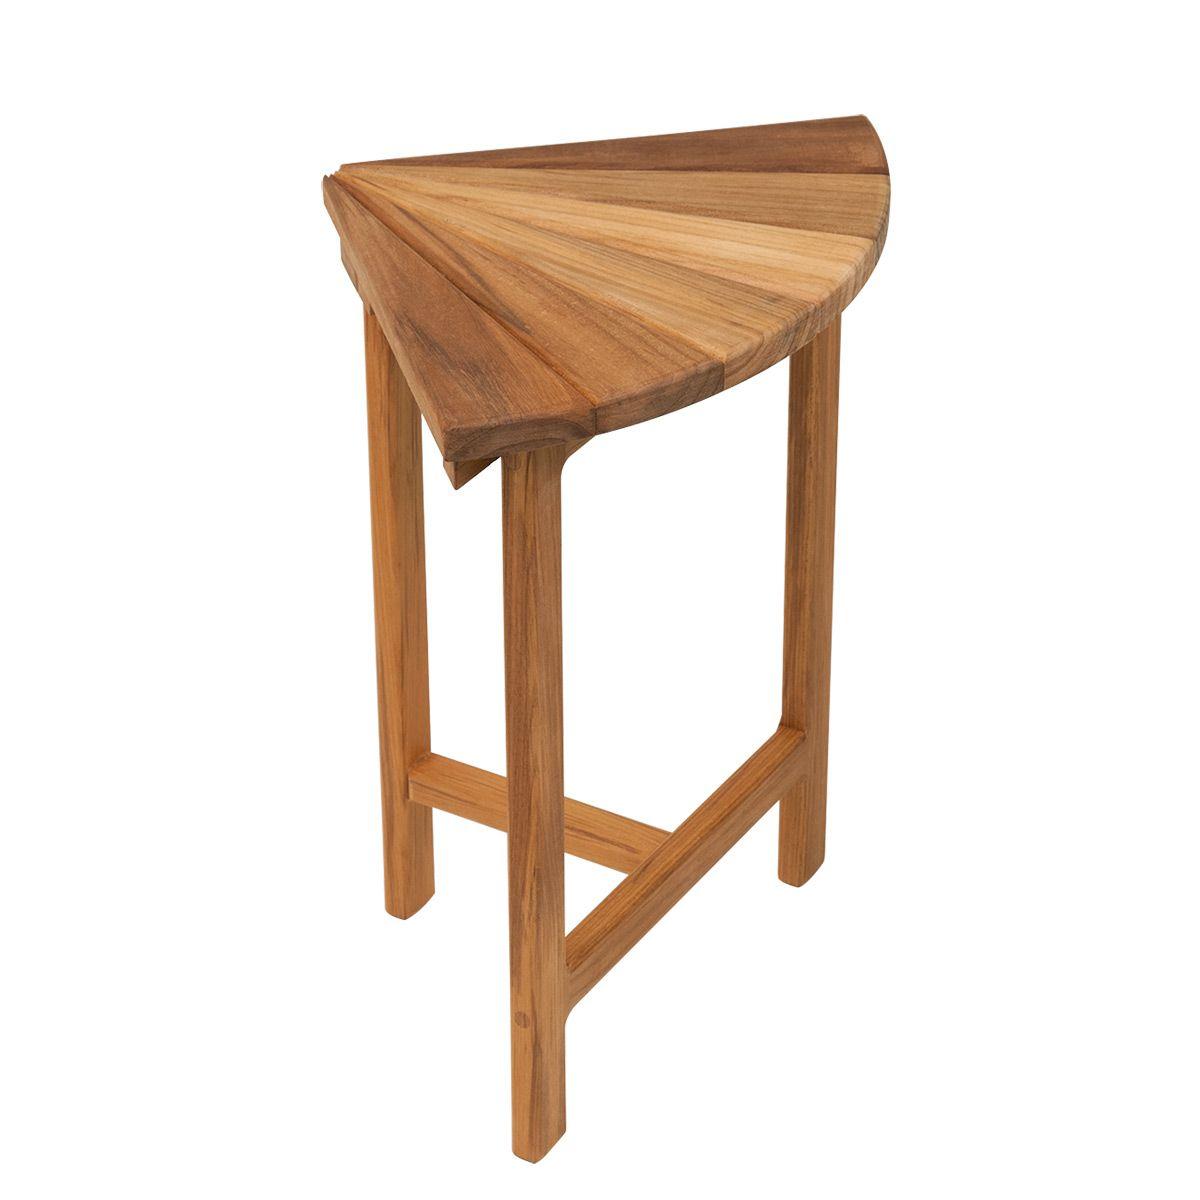 13 X 13 5 Teak Corner Shower Bench With Fan Design Top Teak